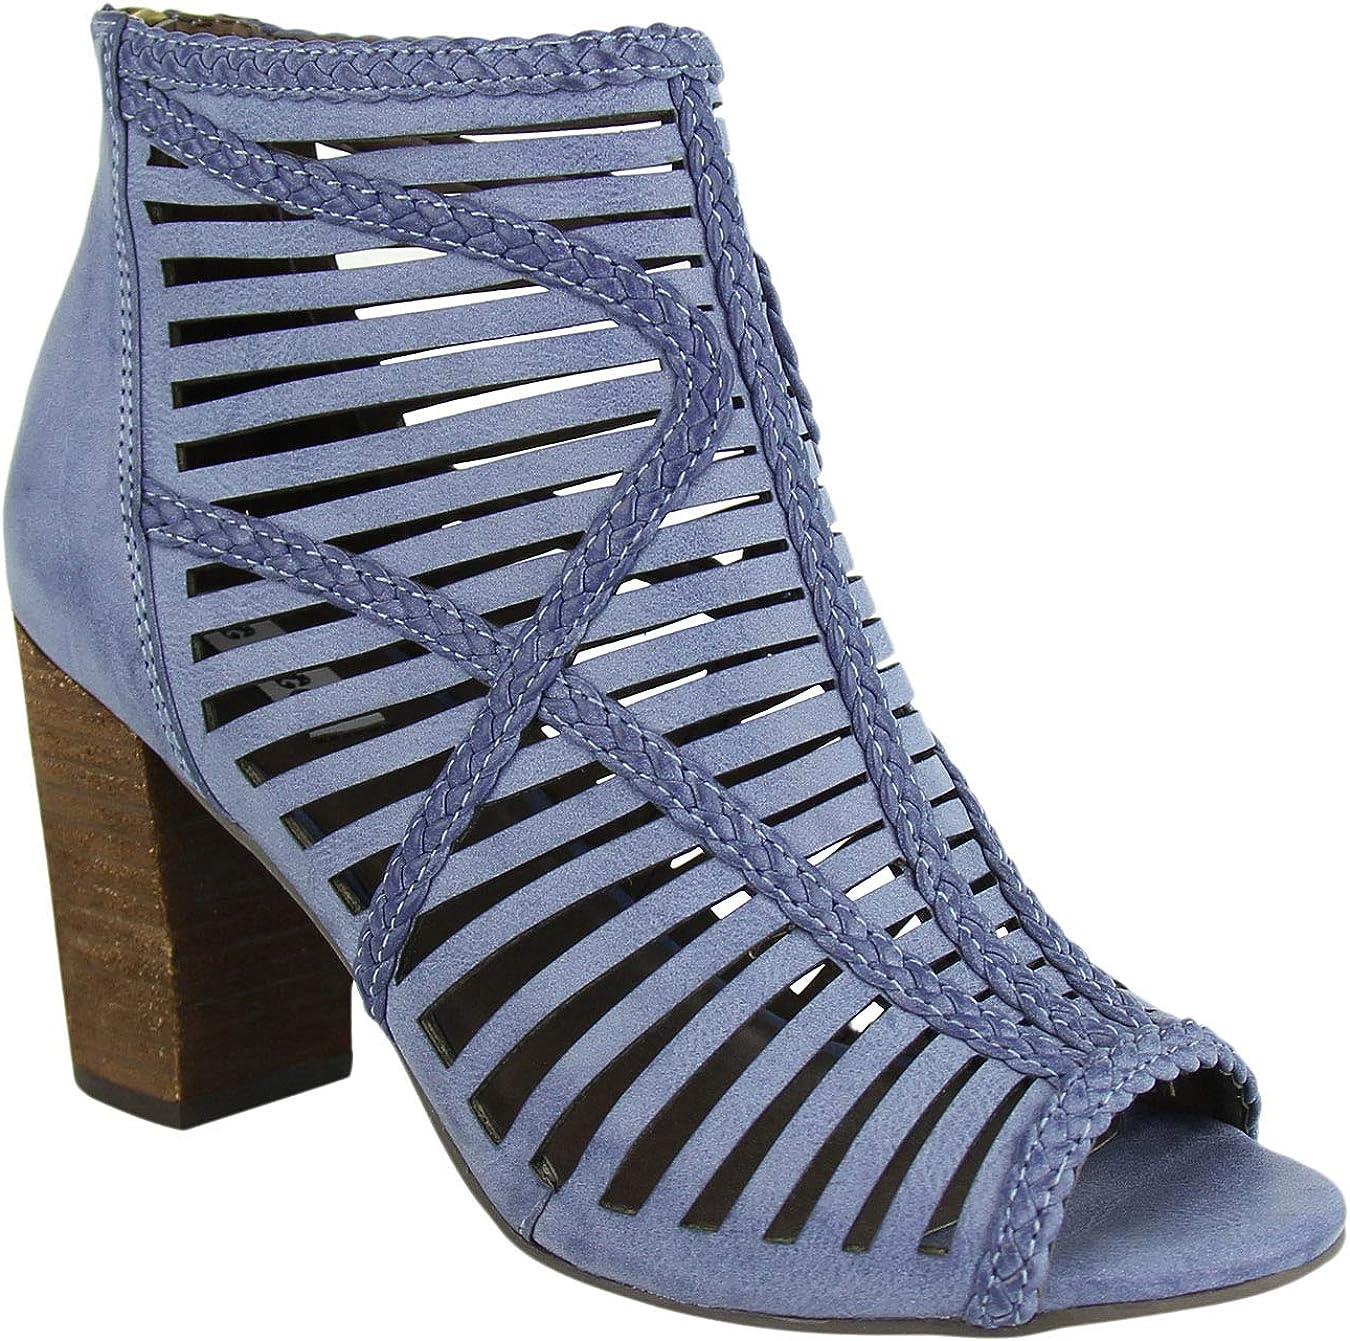 High Heel Open Toe Caged Sandal